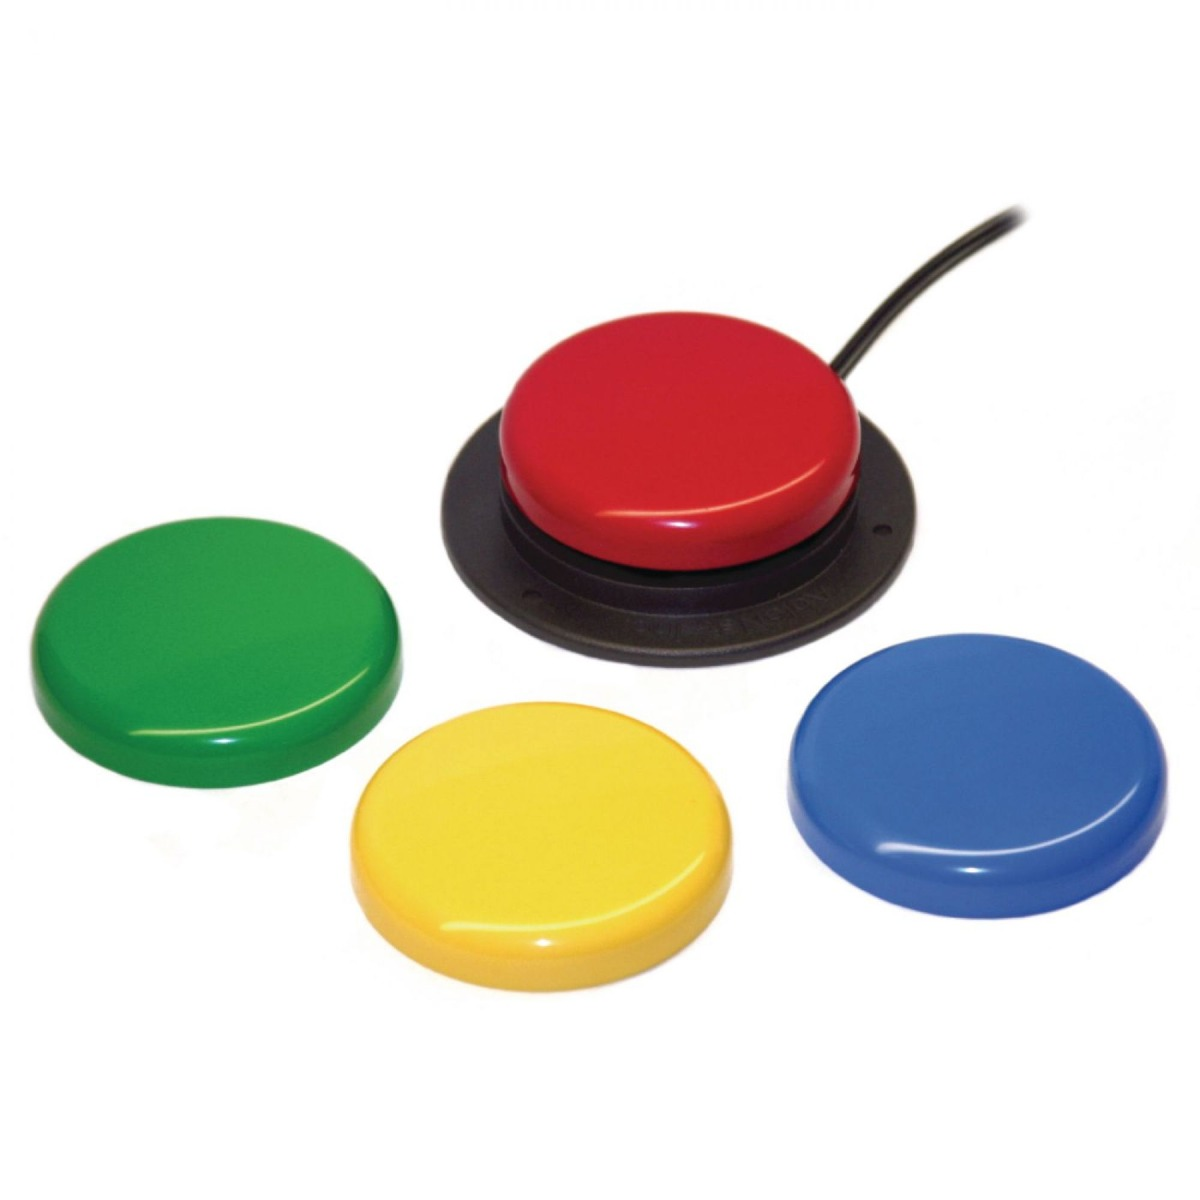 Jelly Bean Twist Adaptive Button Switch